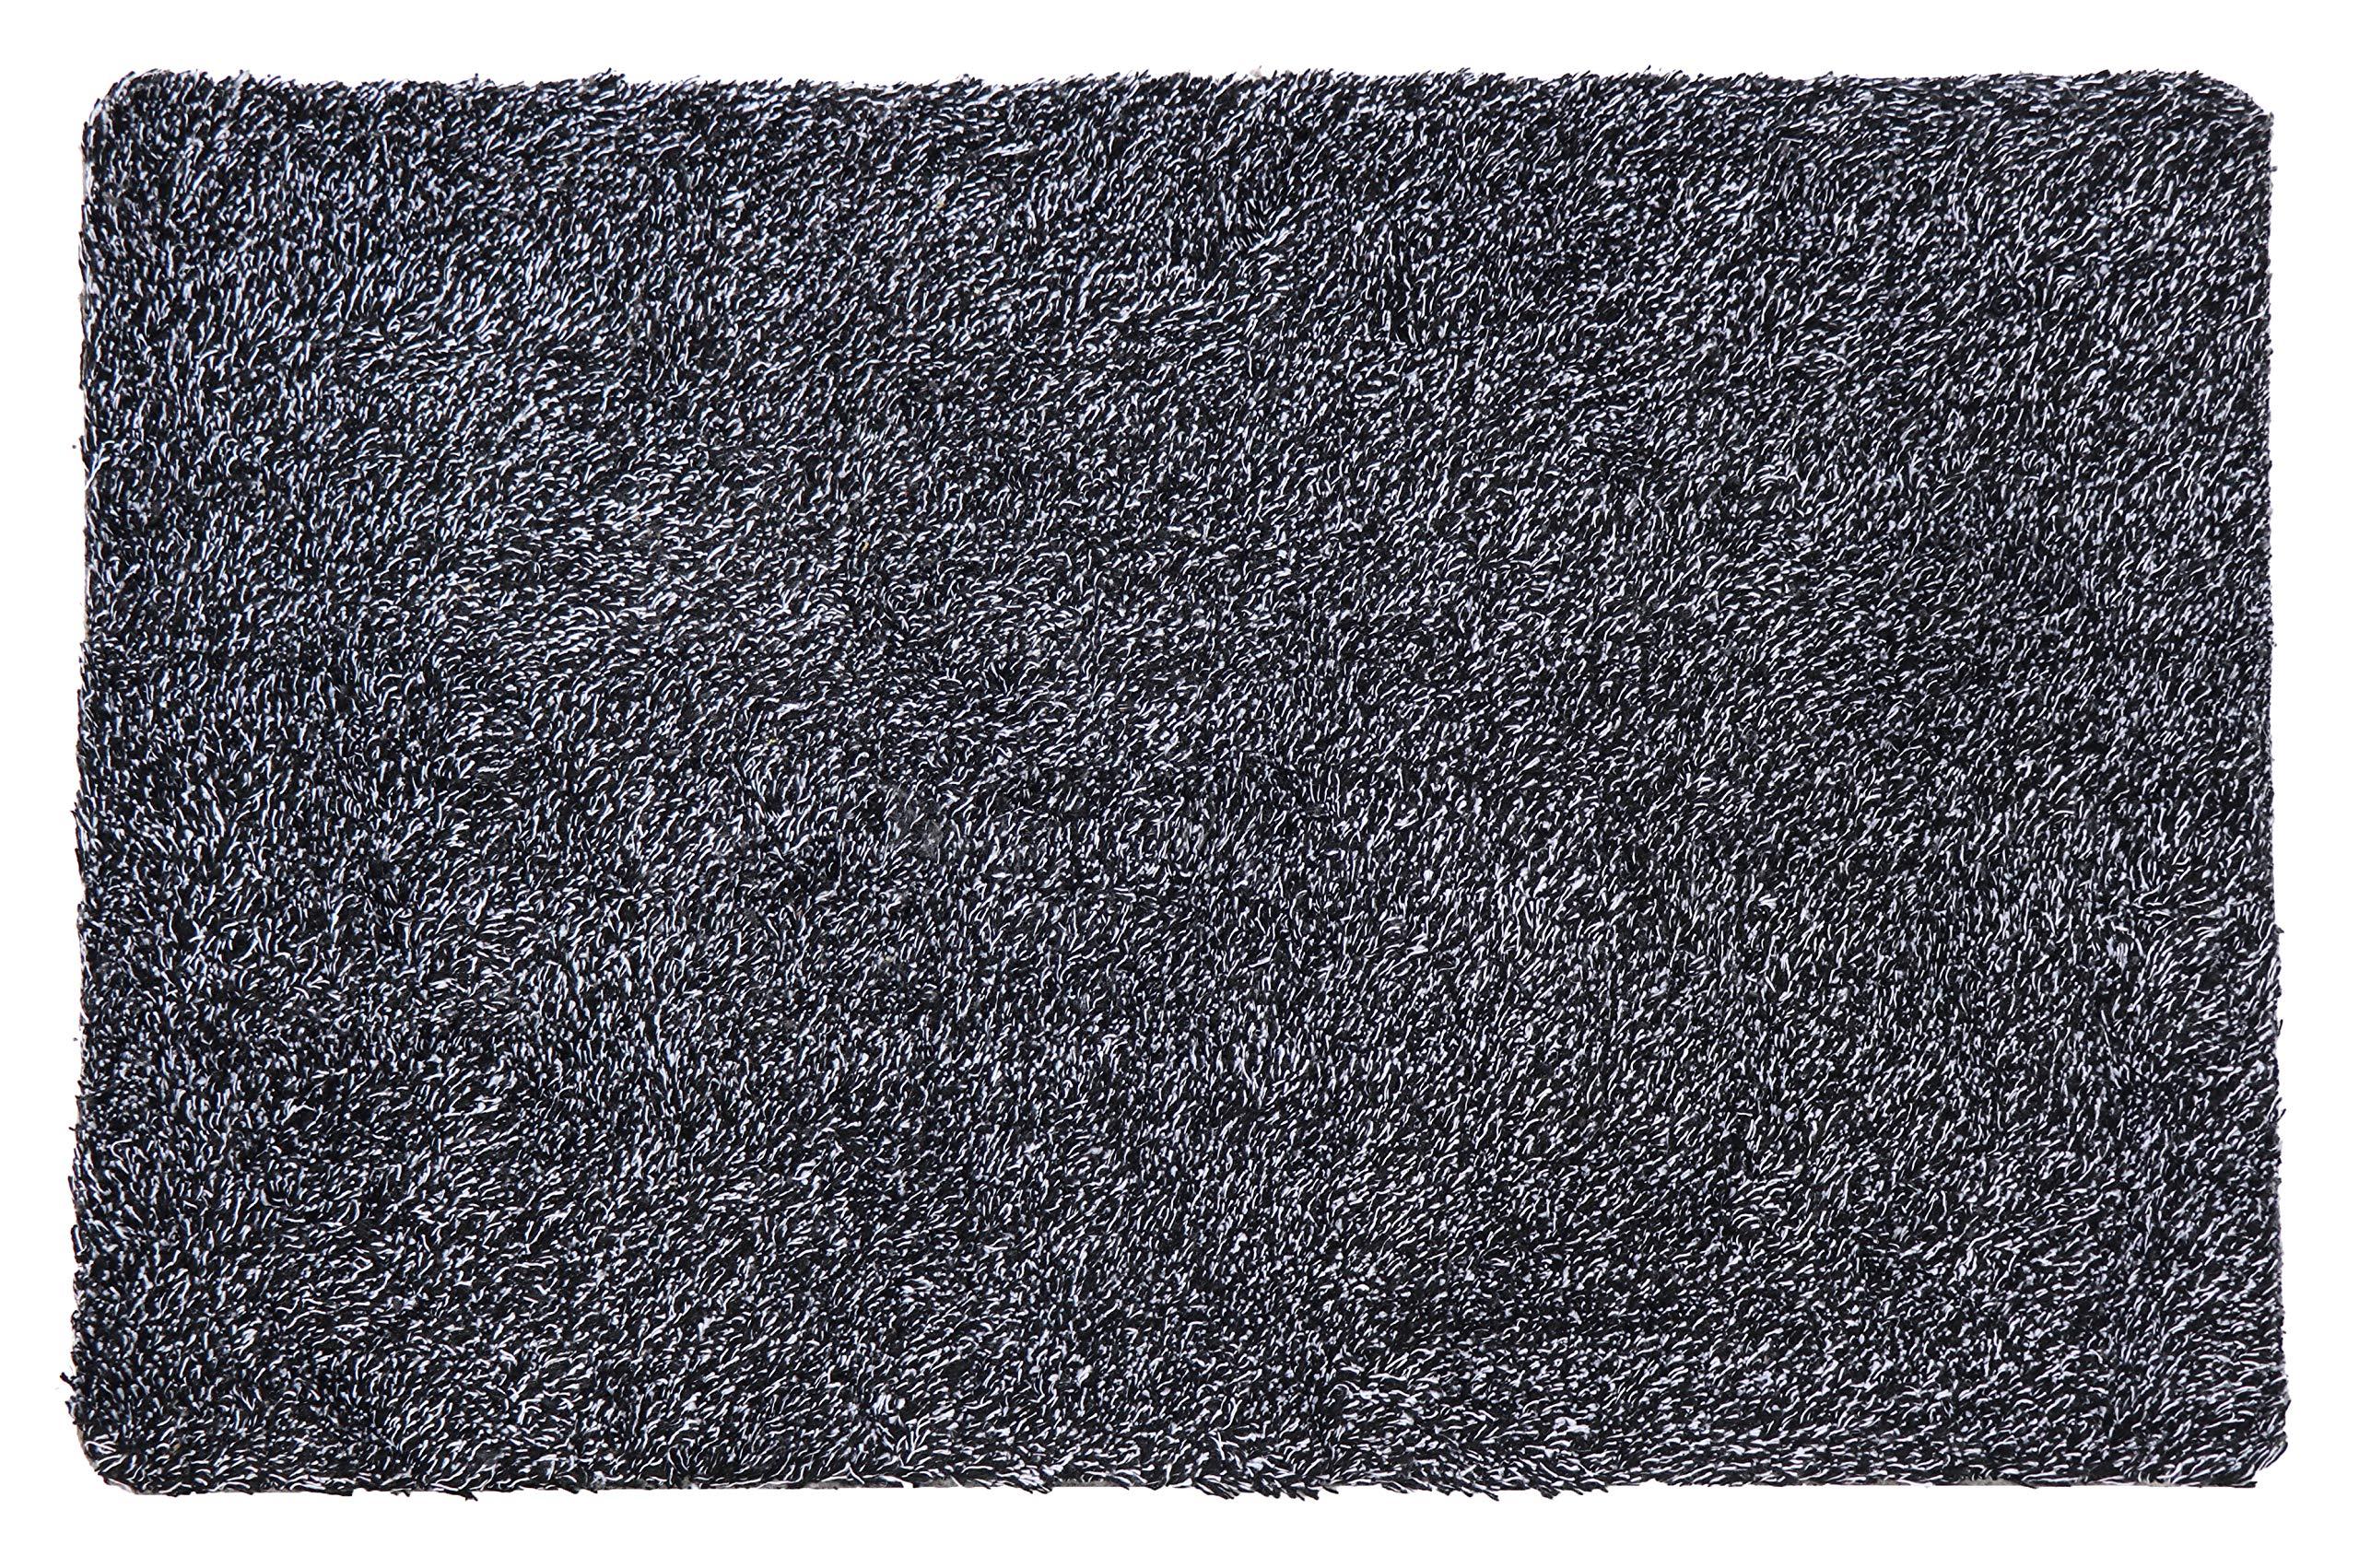 Nevid Indoor Doormat Super Absorbent Non Slip Backing Door Mat Patios Inside Dirt Trapper Mats 18'' x 28'' Entrance Rug Cotton Microfiber Carpet Black